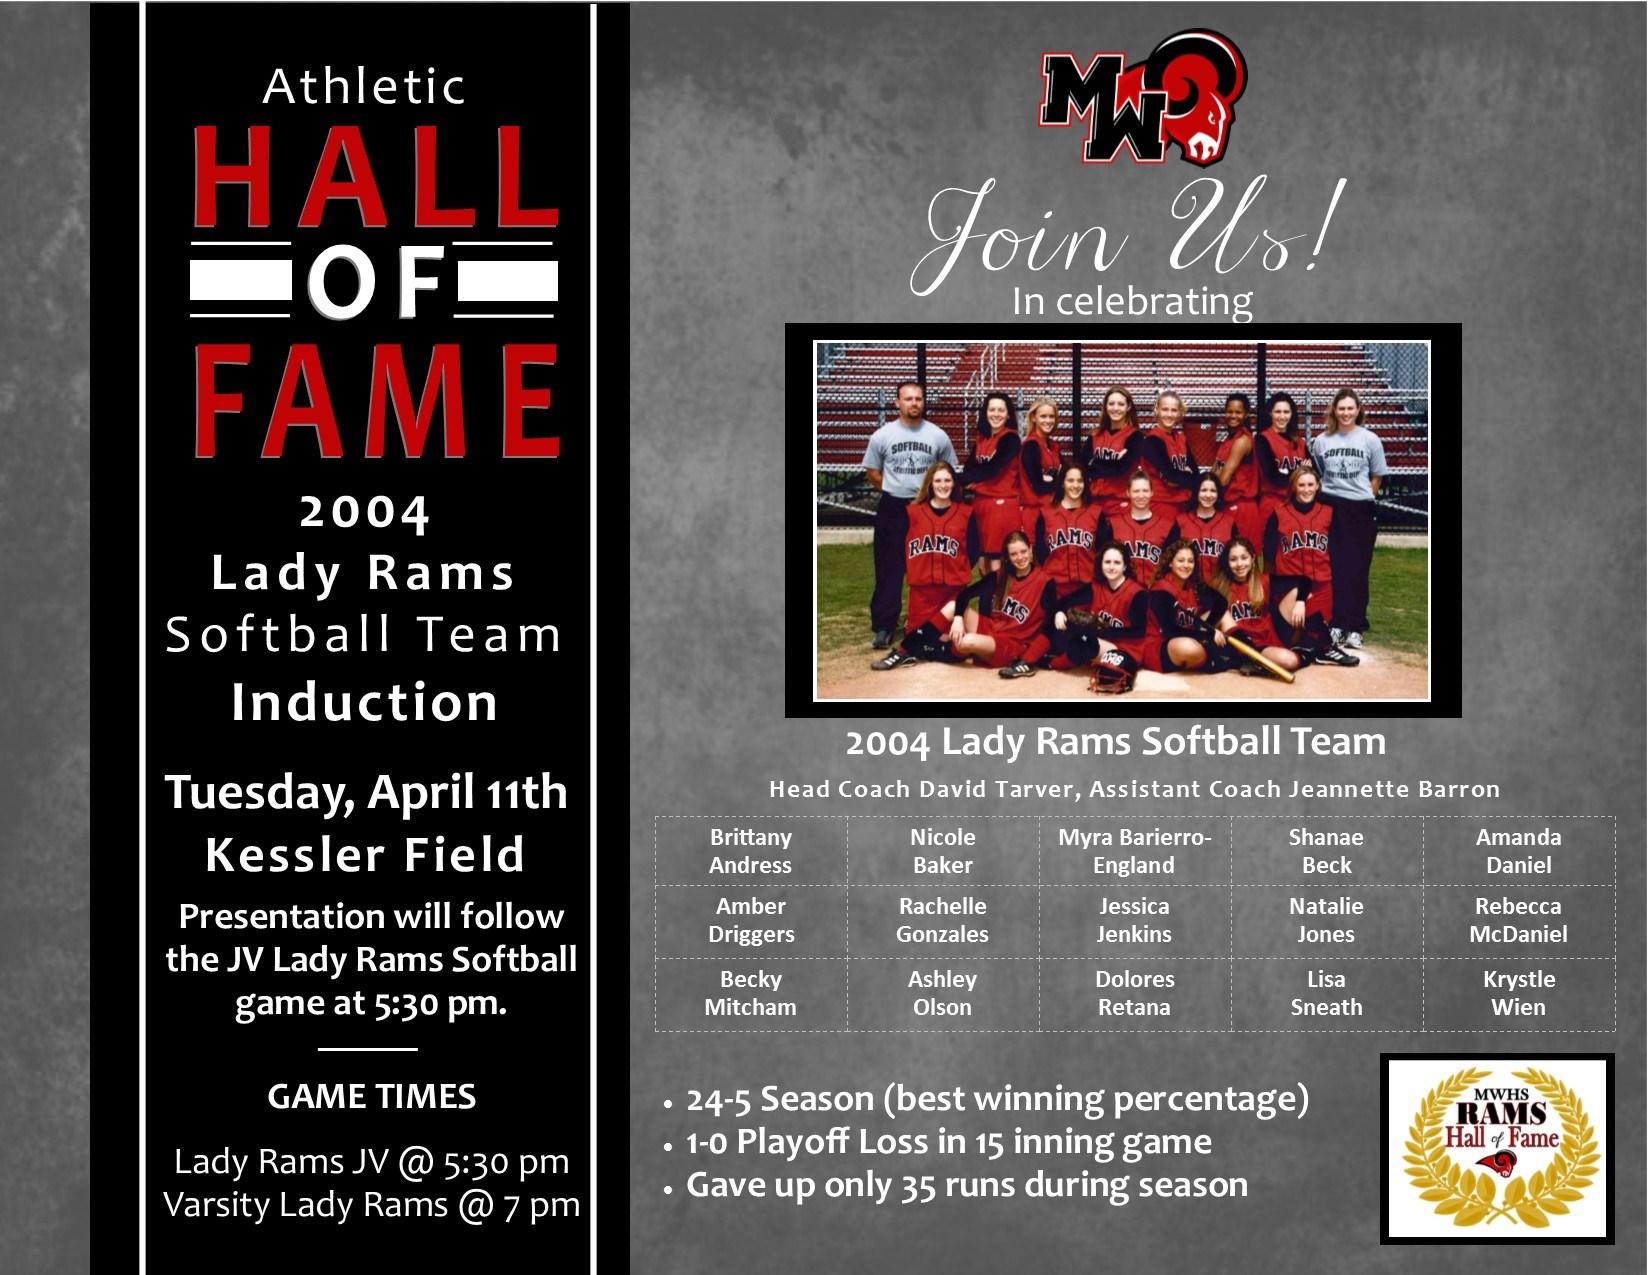 2004 Lady Rams Softball Team